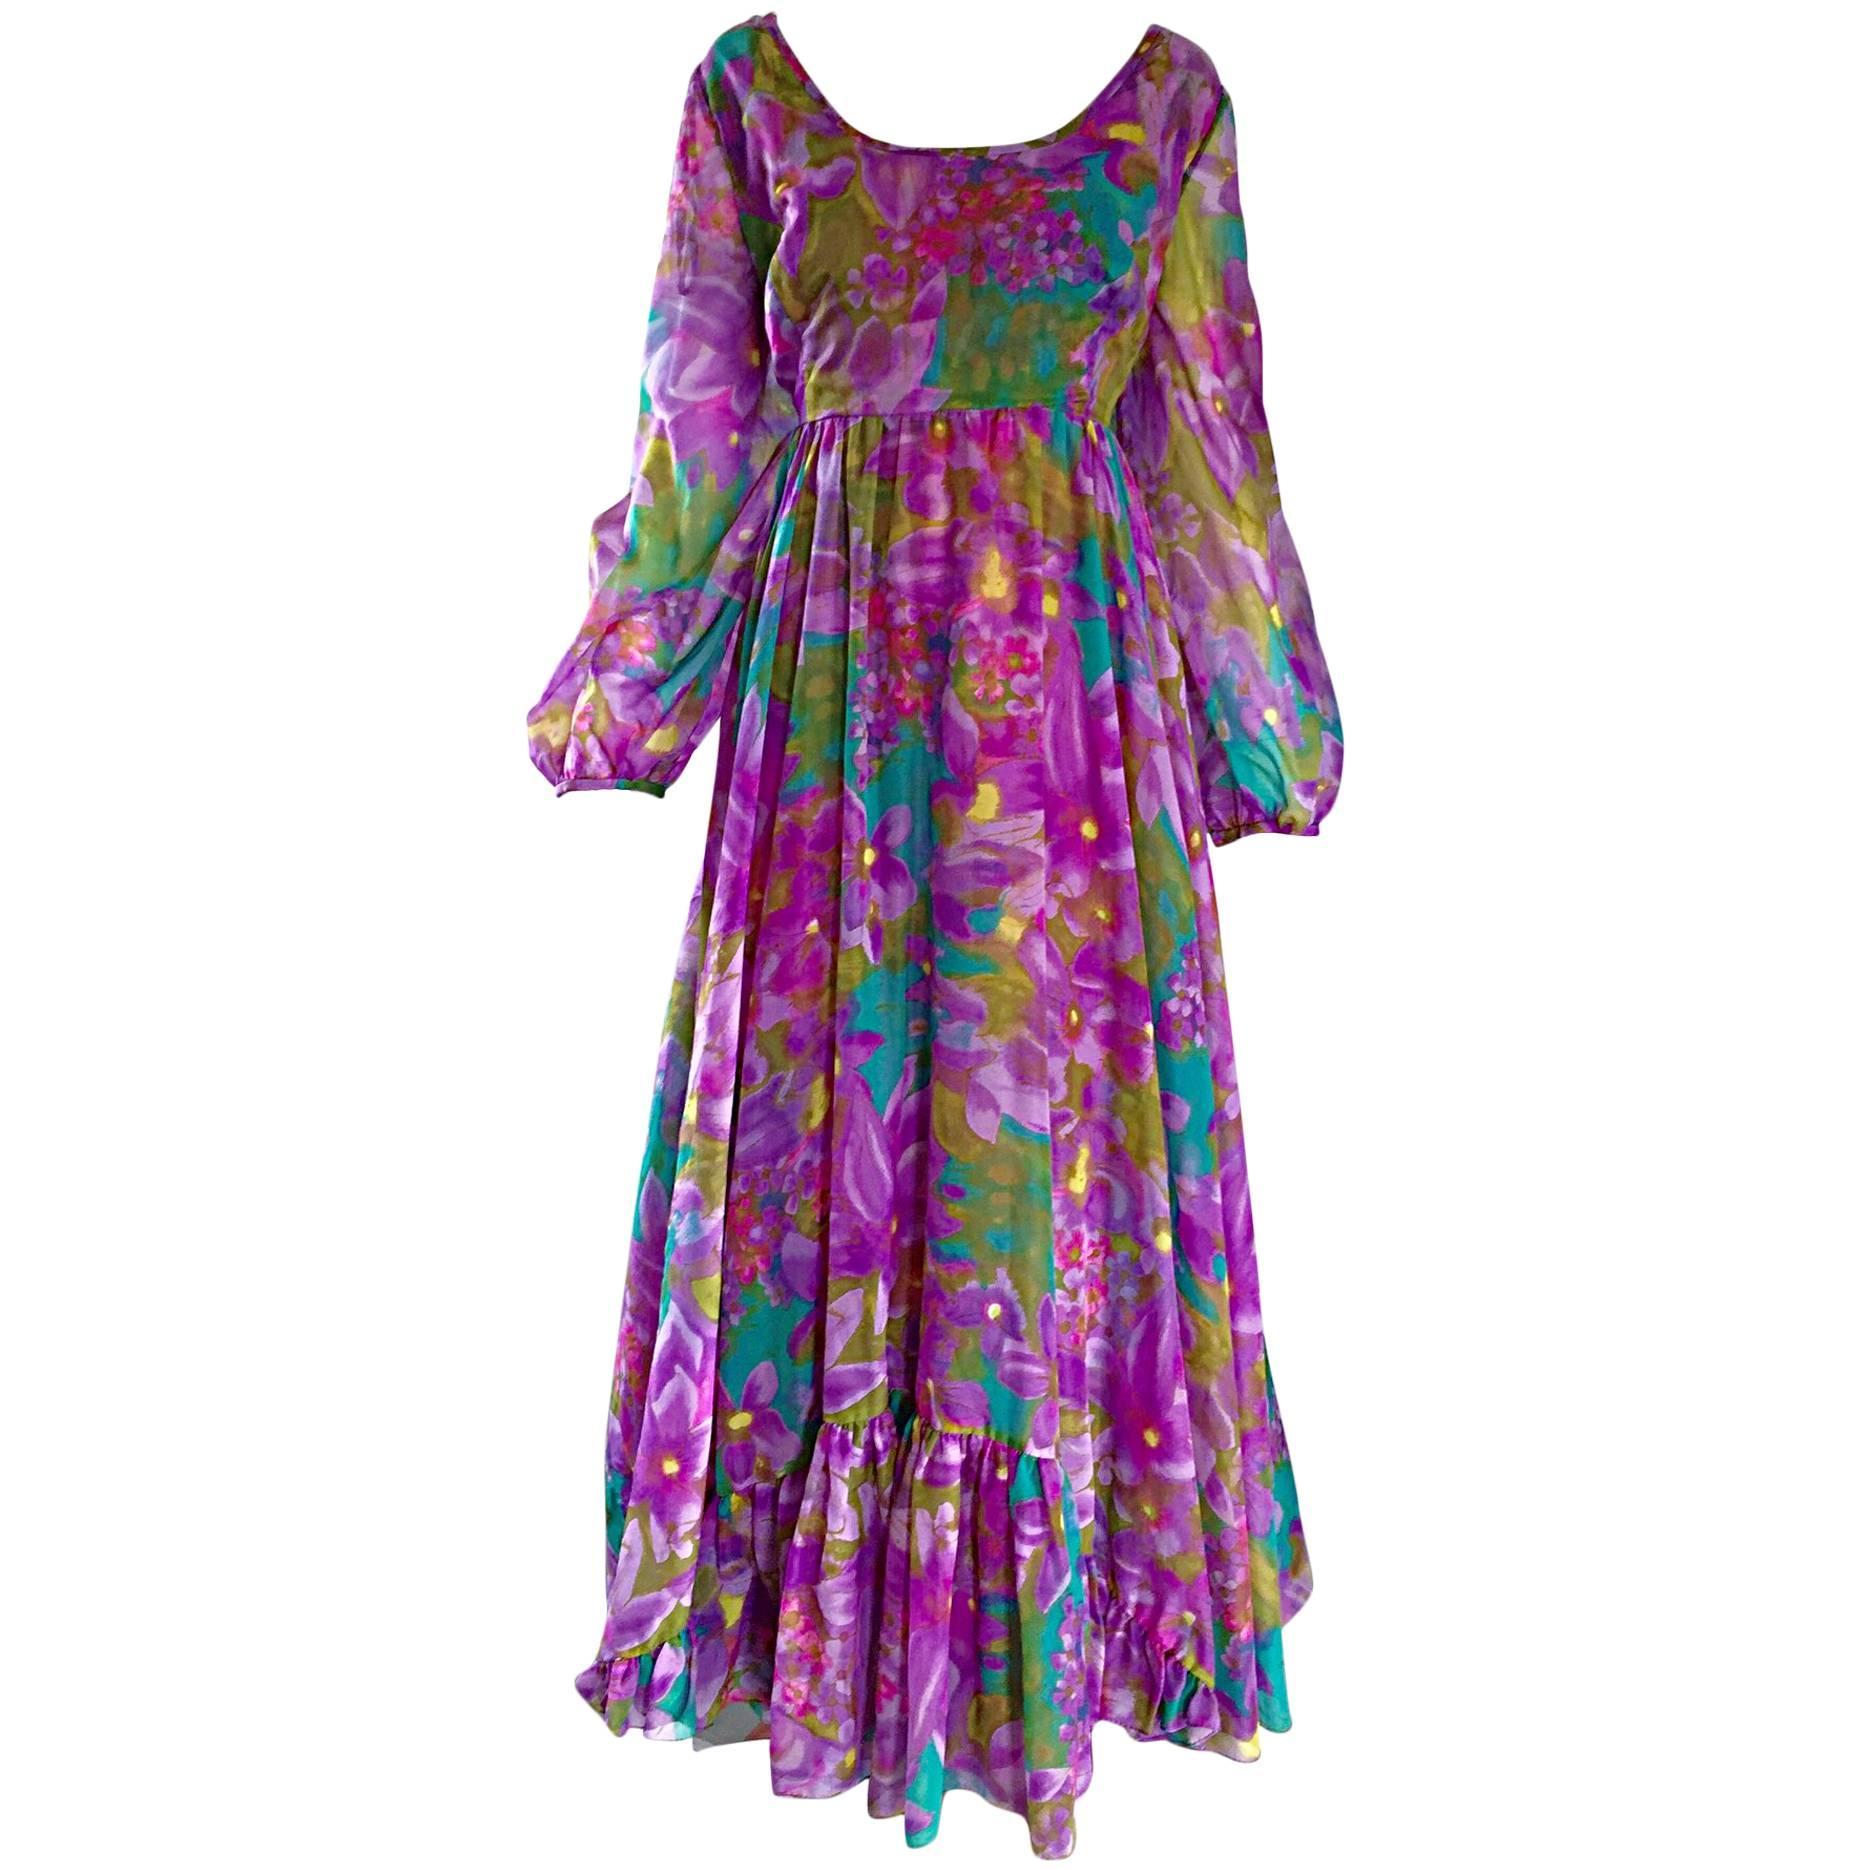 Plus Size Vintage Mr. Blackwell Gorgeous 1970s Size 22 Chiffon Maxi Dress Gown